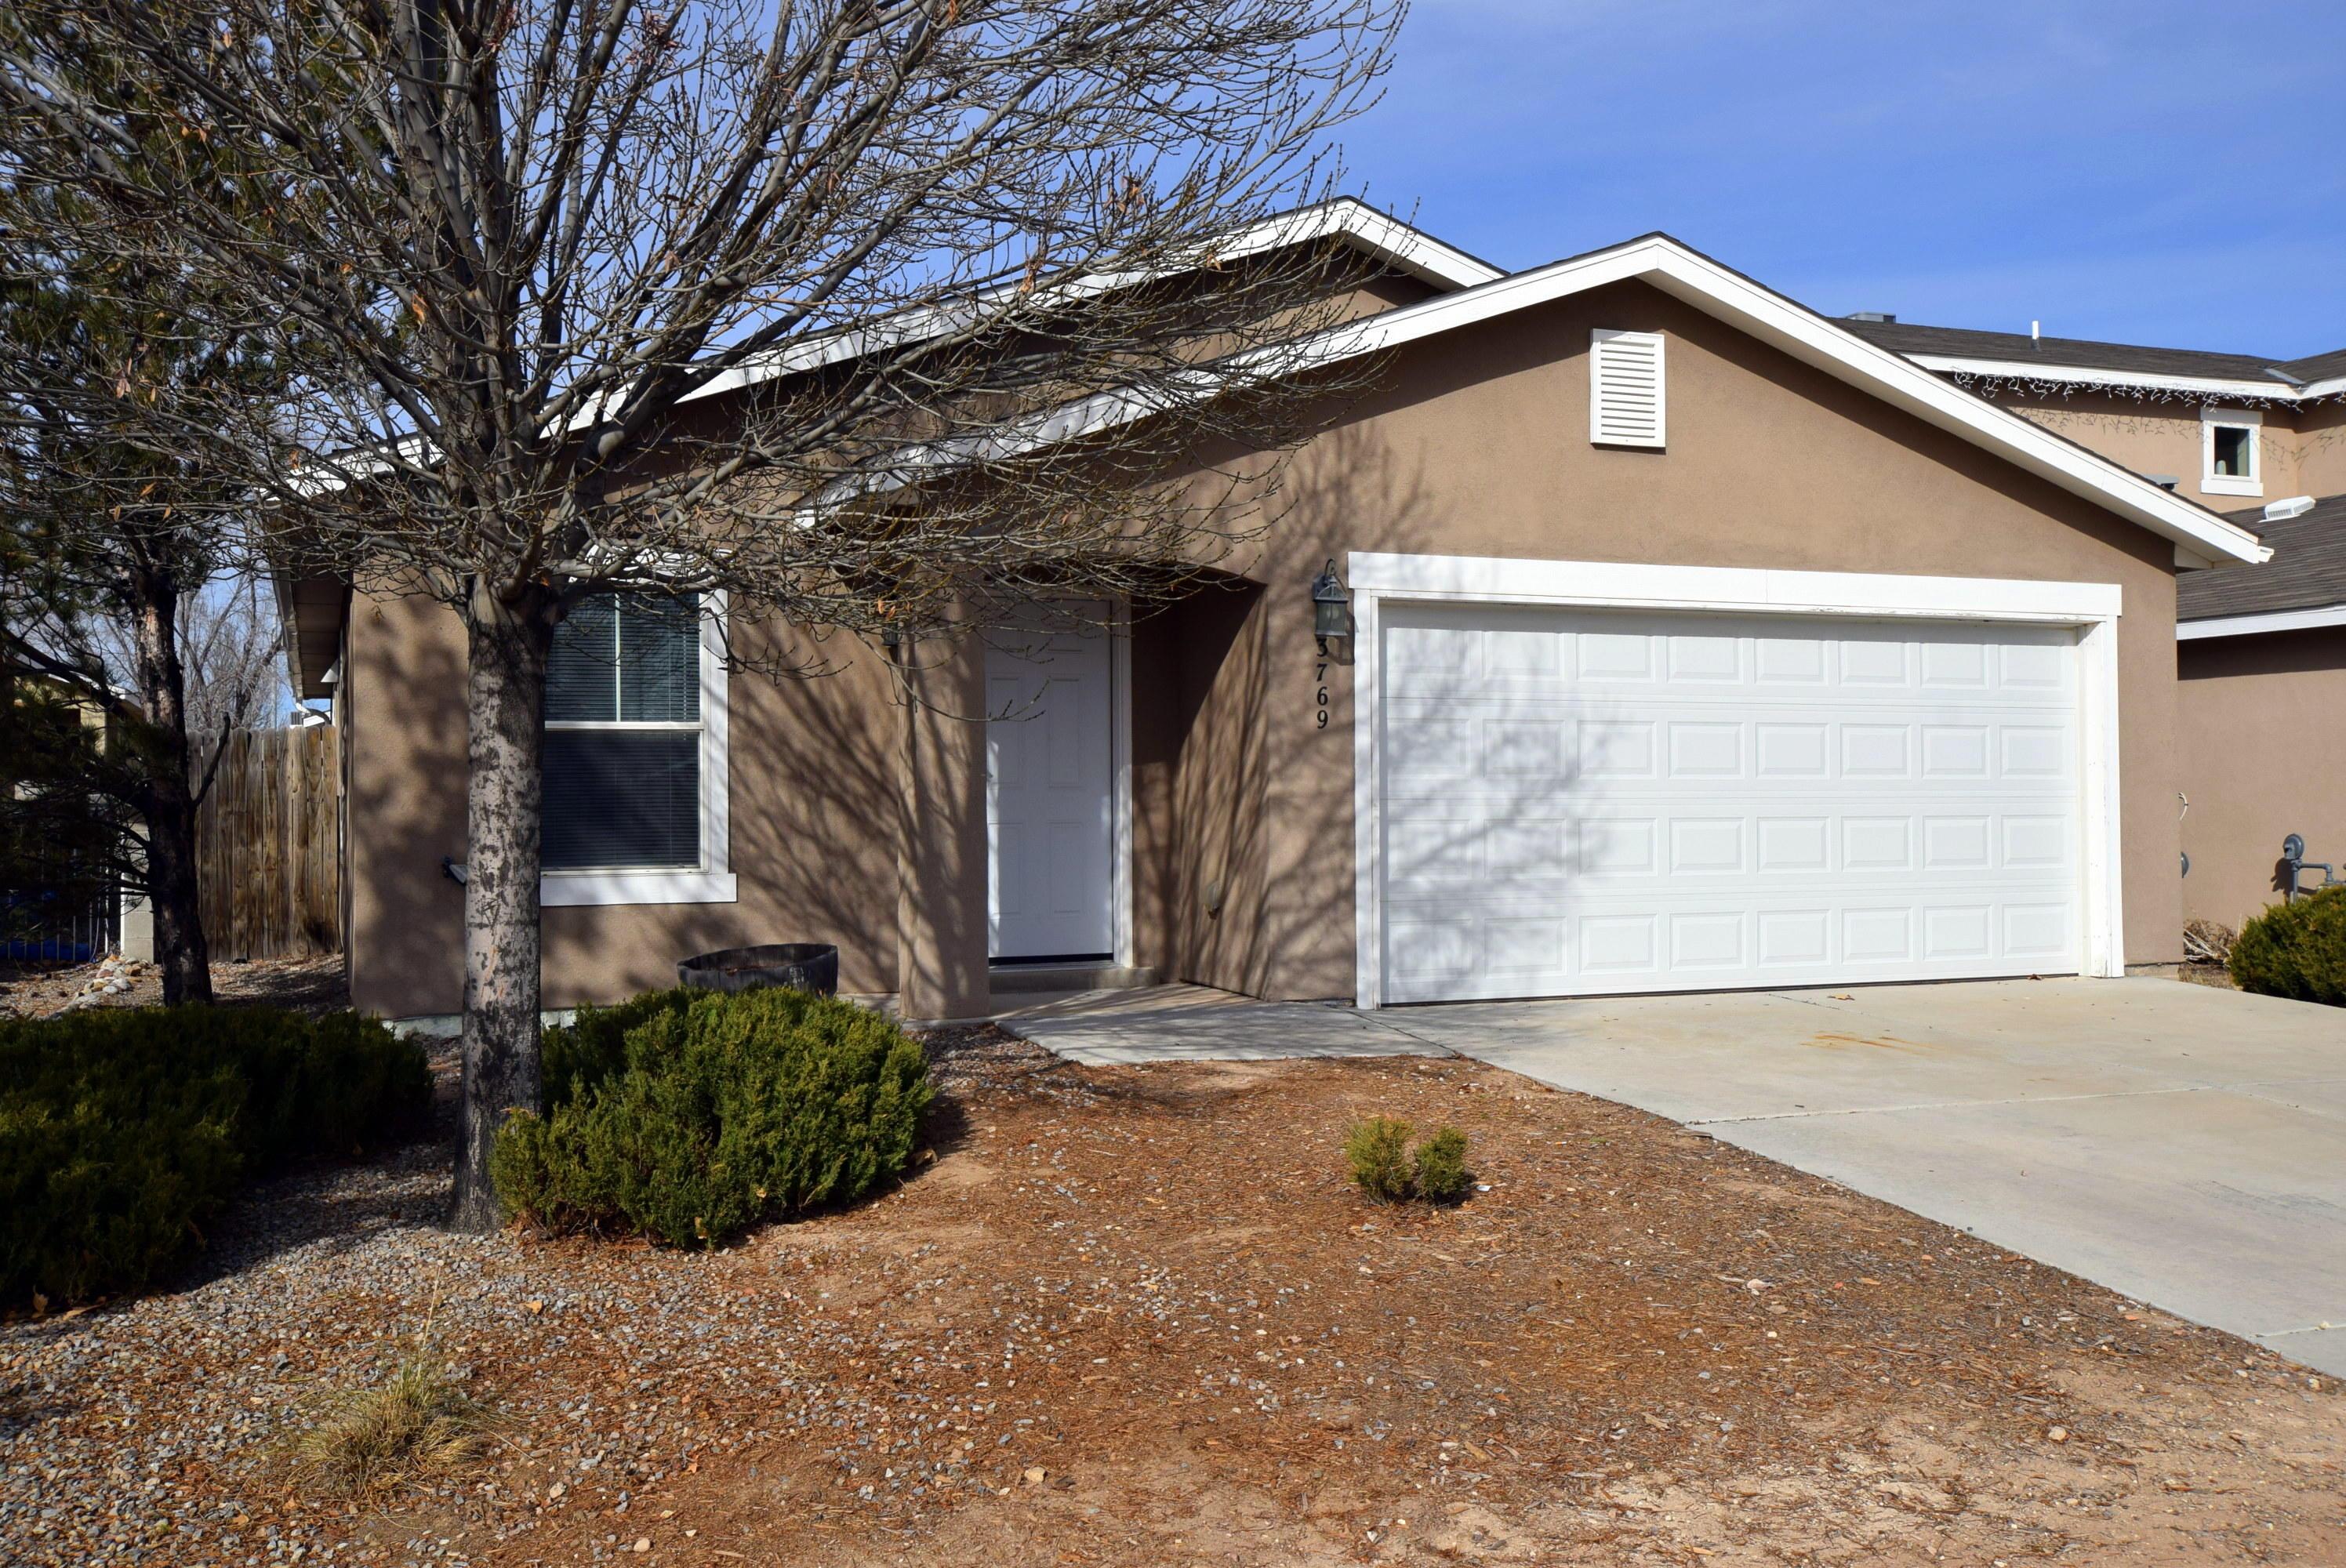 3769 NE Rancher Loop, Rio Rancho in Sandoval County, NM 87144 Home for Sale